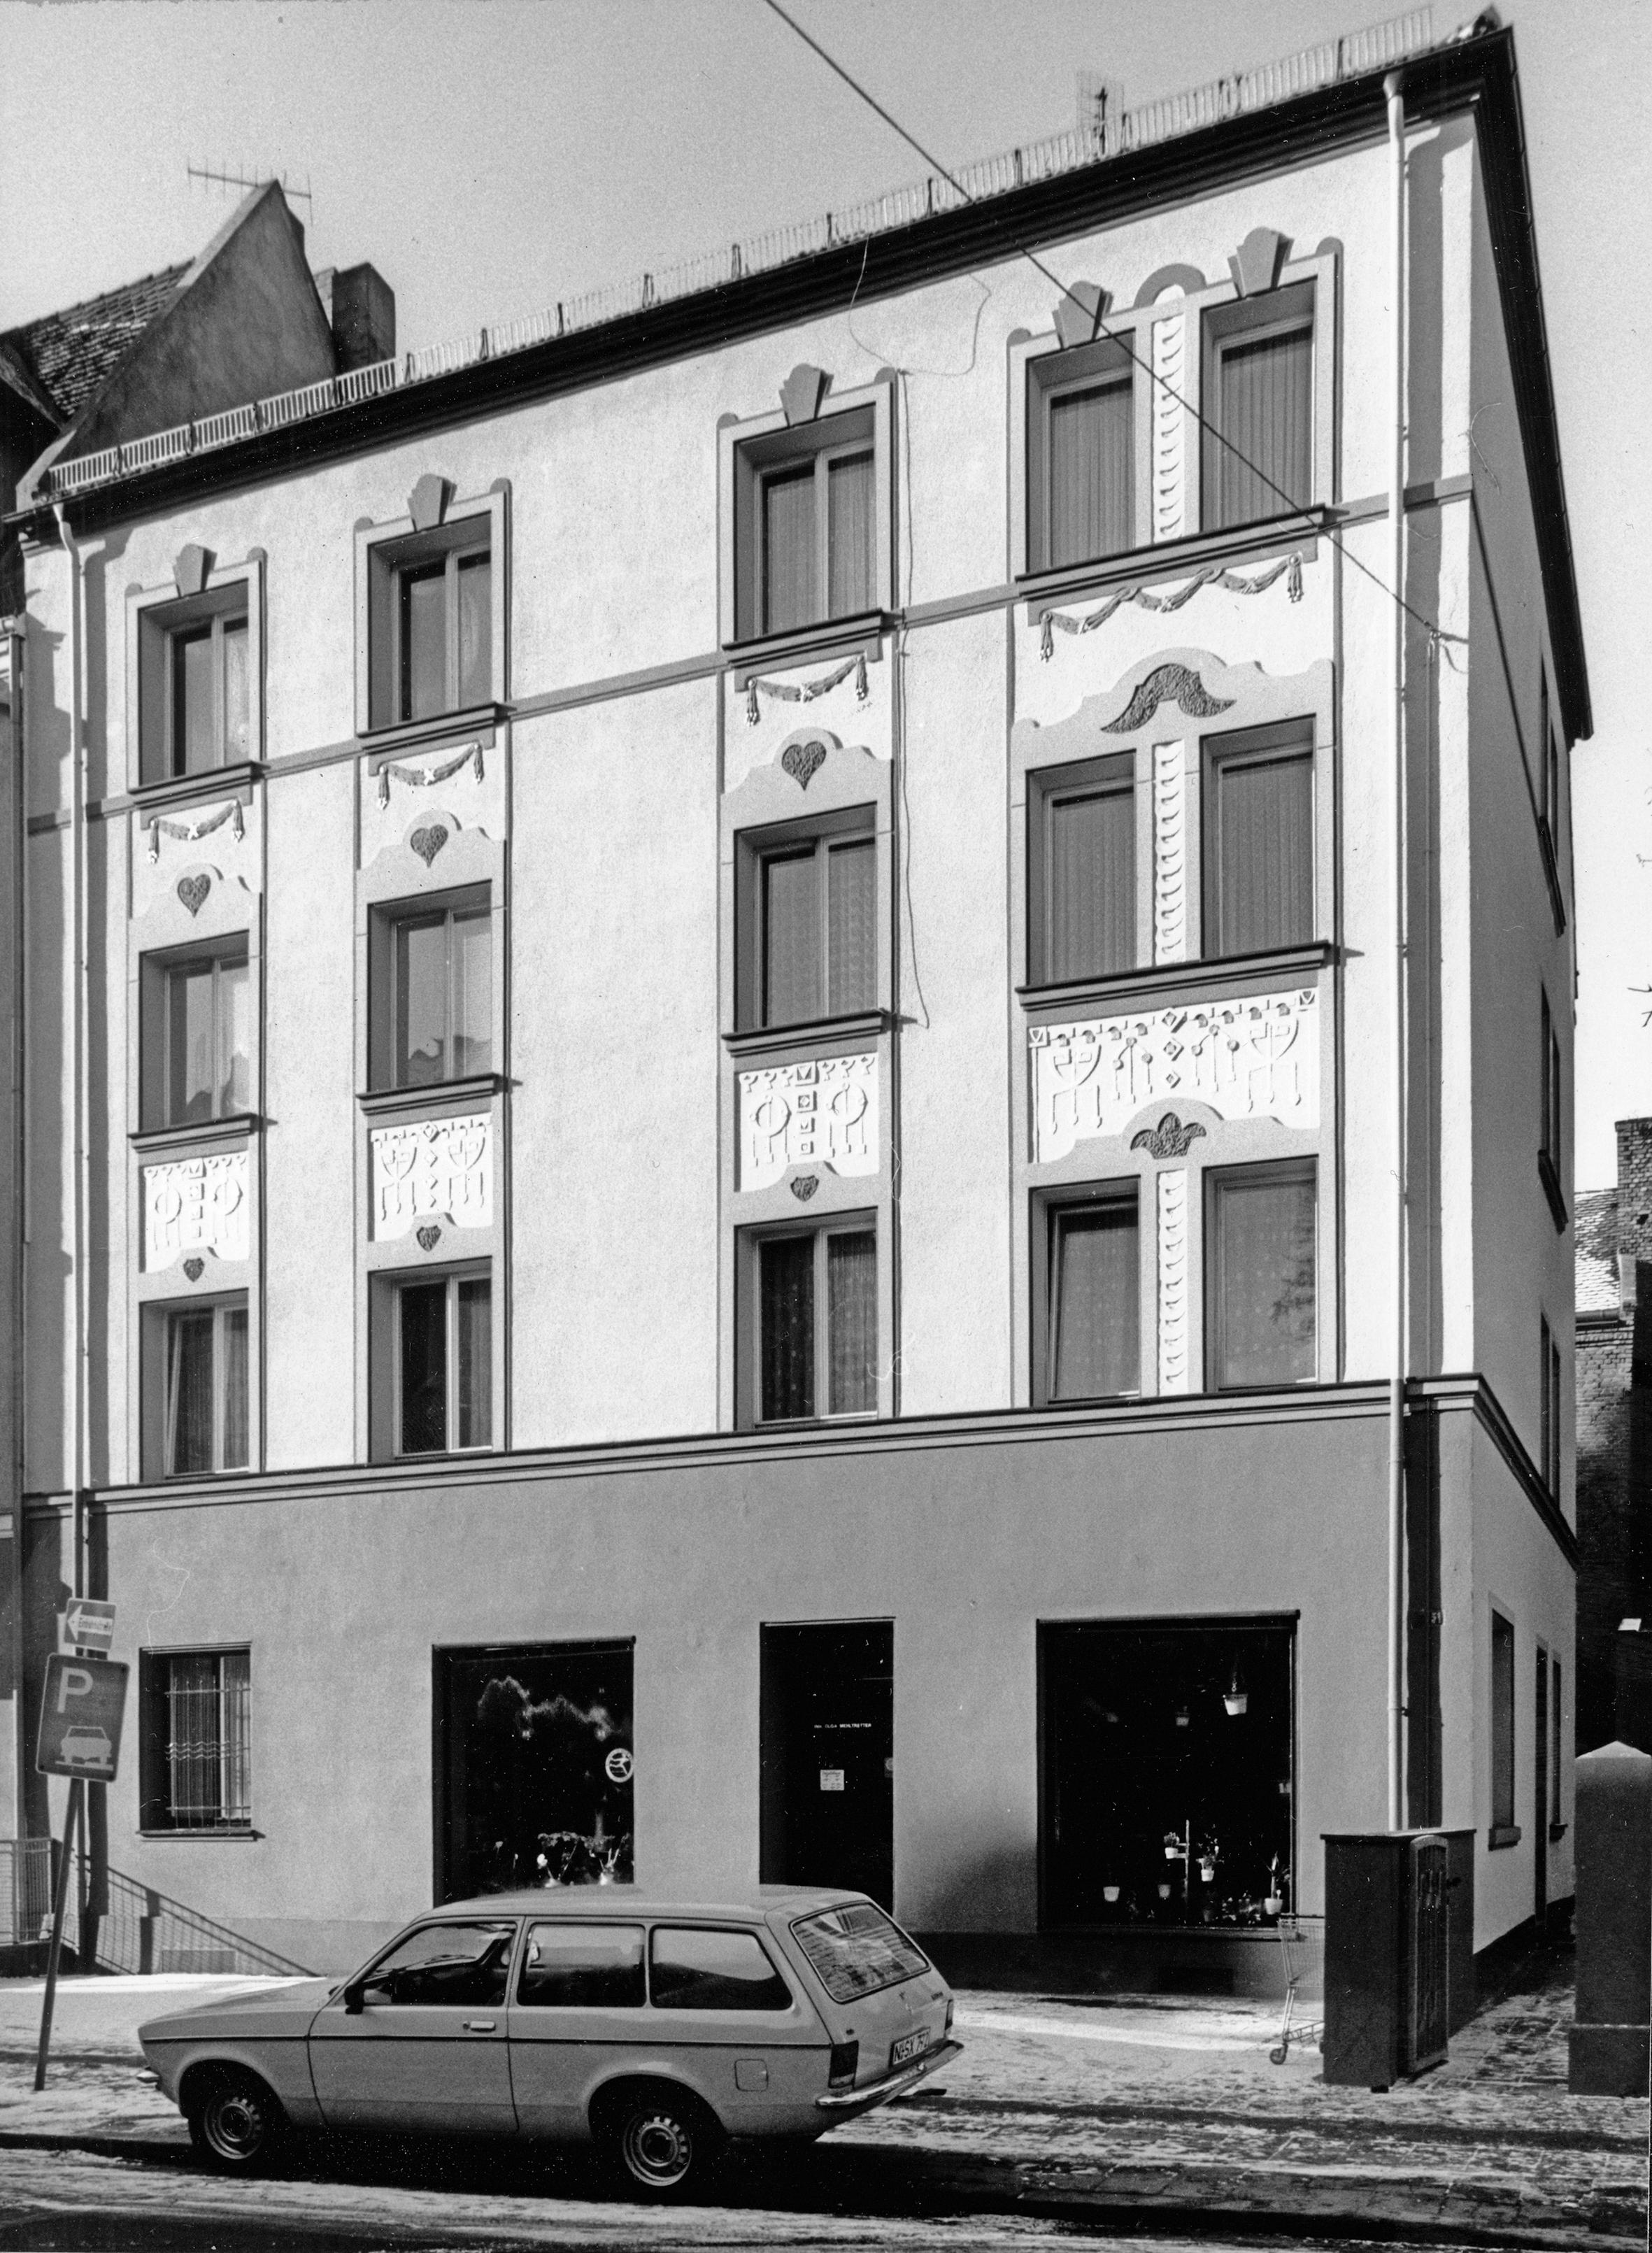 Bismarckstraße Nürnberg schoppershofstraße 51 stadtbild initiative nürnberg